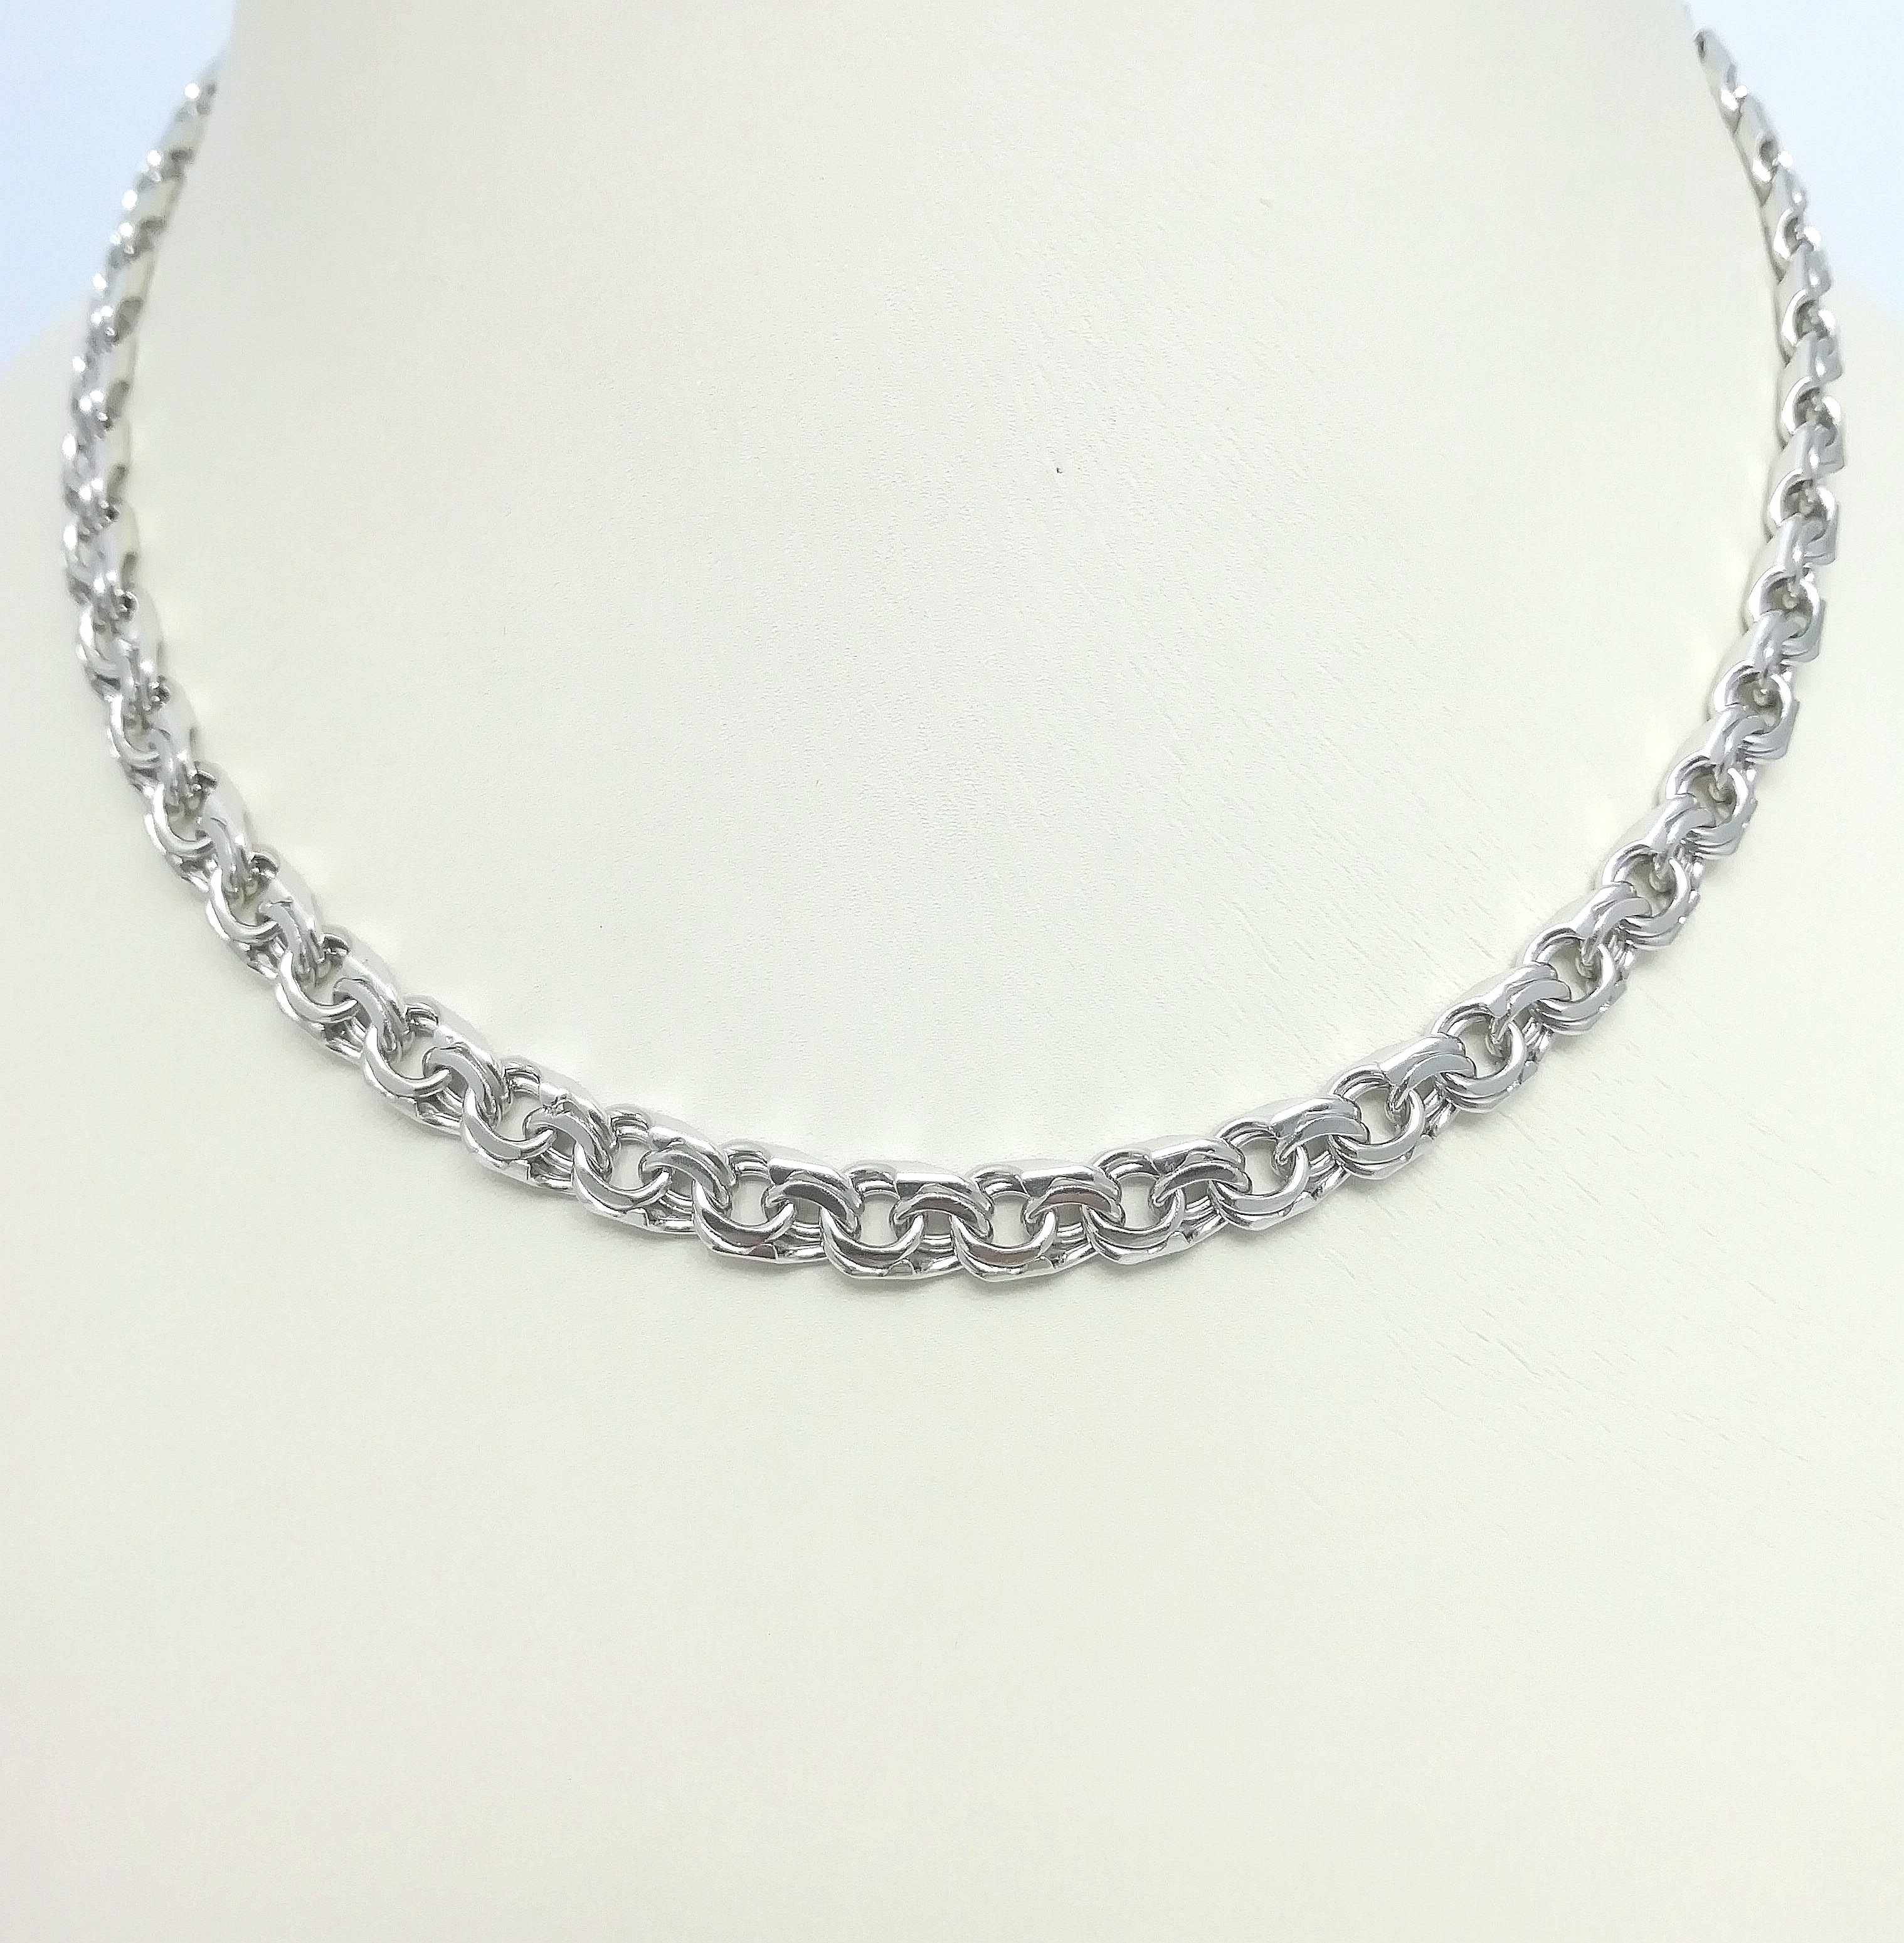 Серебро цепь дк240920-153 36,40гр